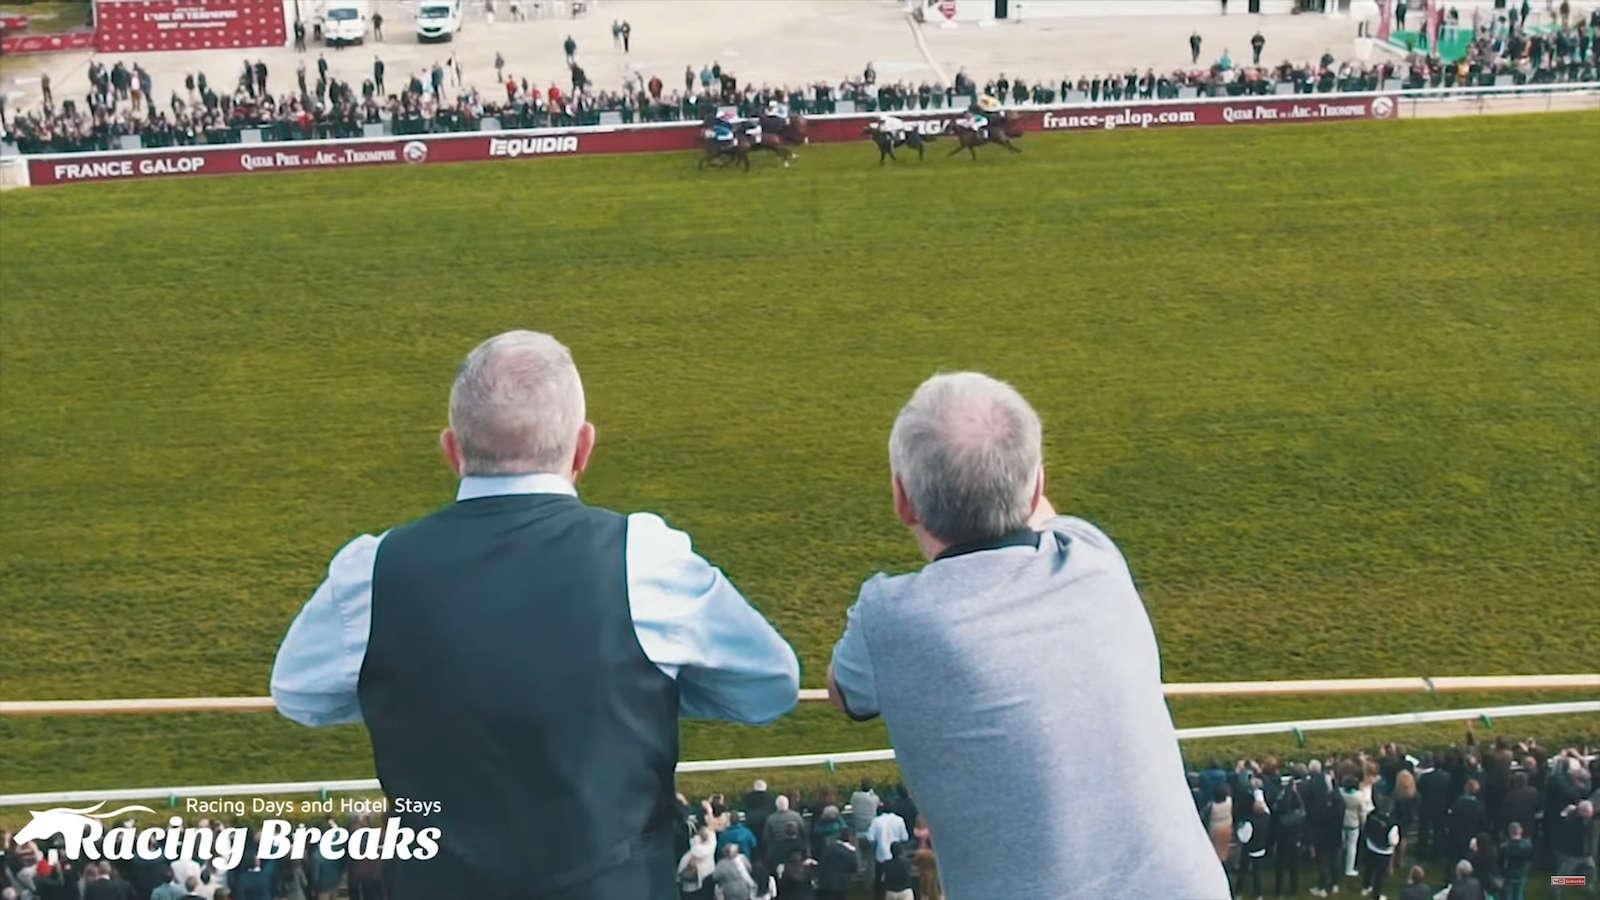 Horses racing at ParisLongchamp